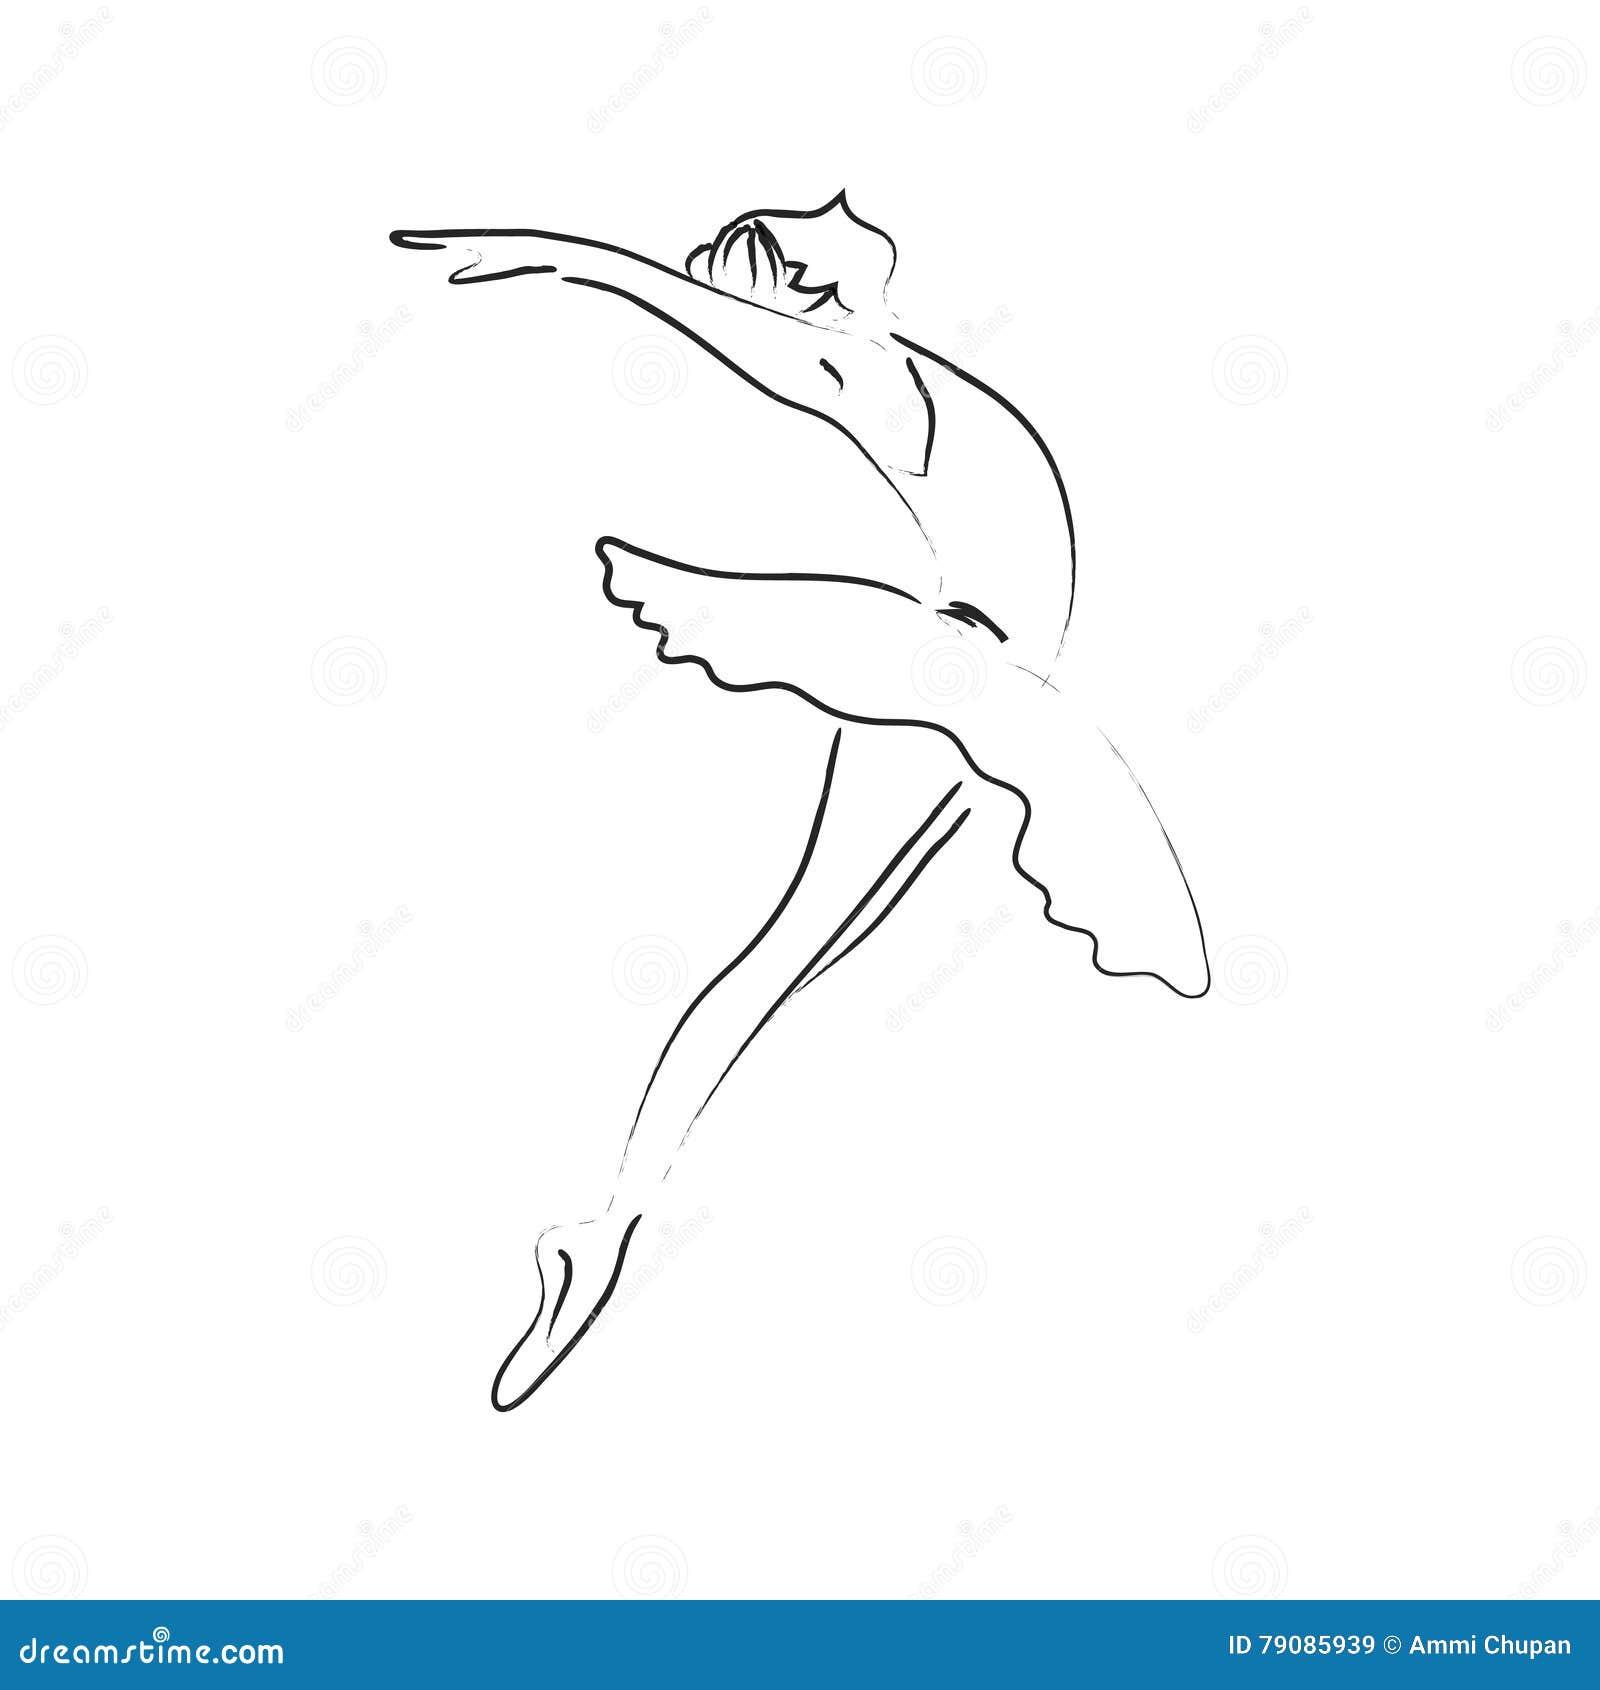 Dream Dance By Line Art Inc : Abstract ballerina stock photo cartoondealer